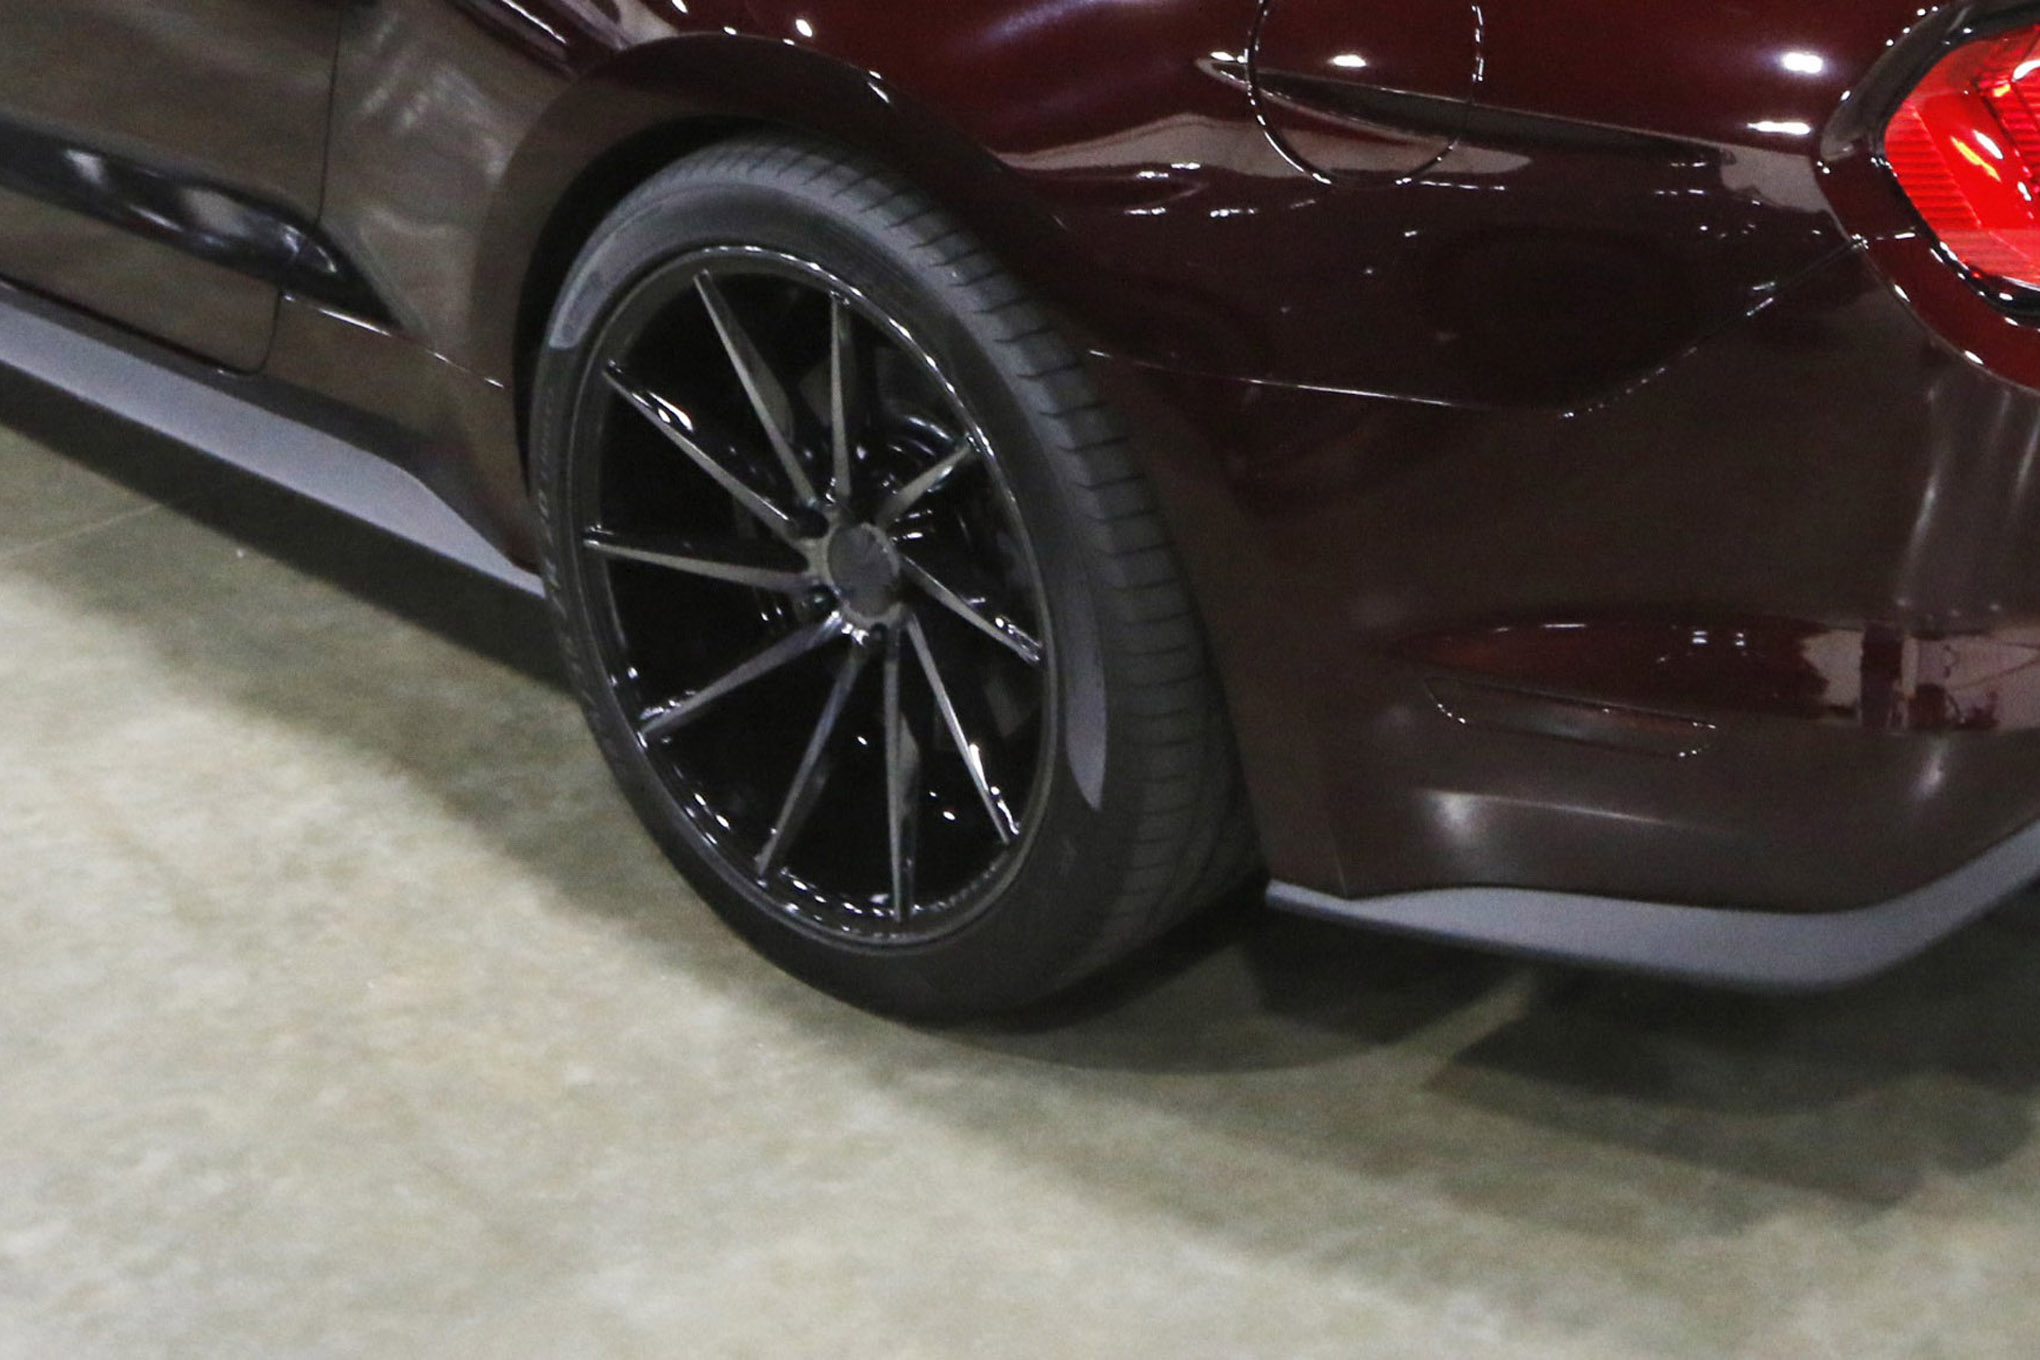 11 2018 Mustang Week Edition Mustang Convertible Vossen Wheels